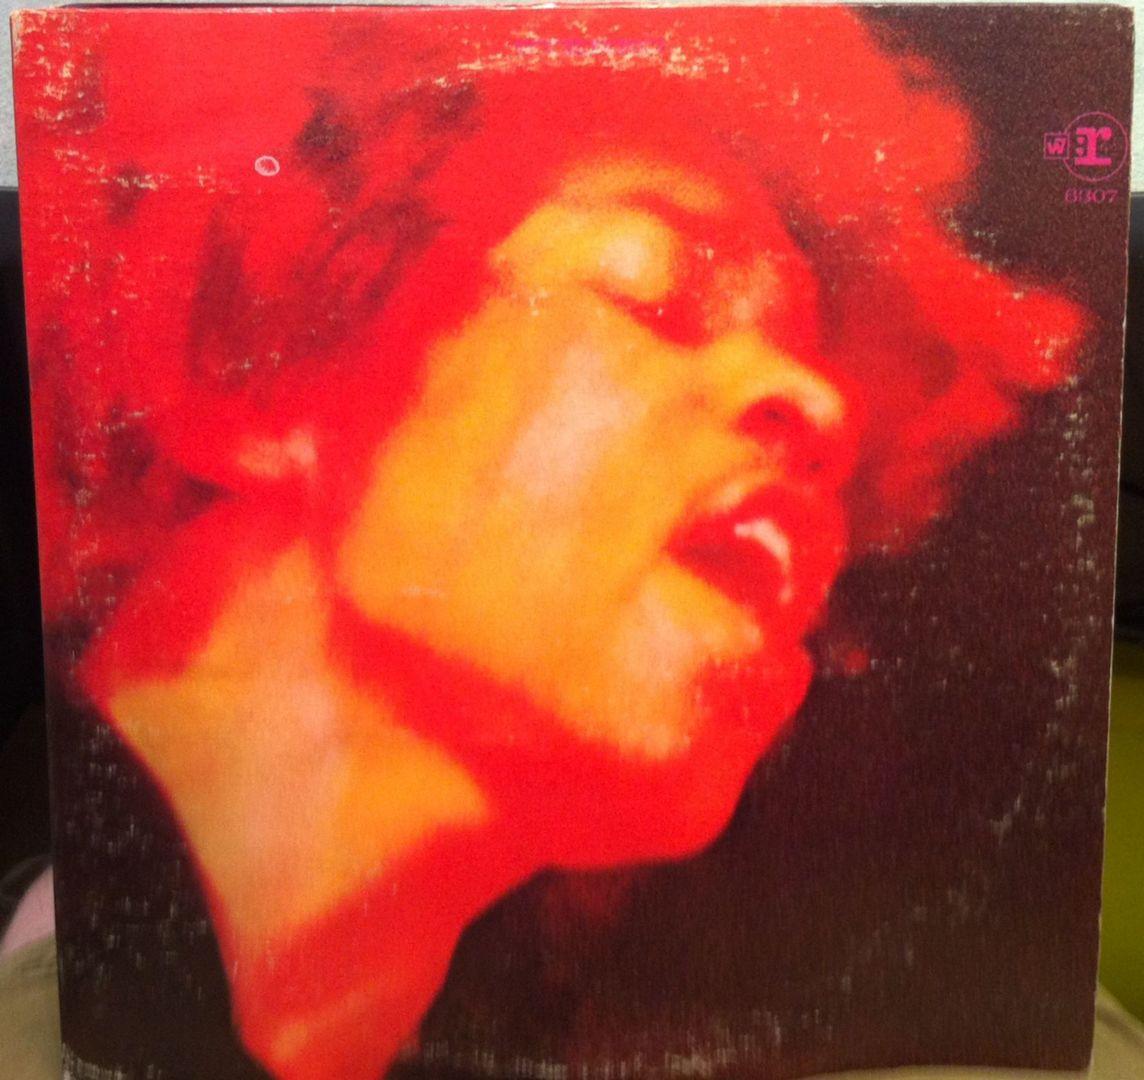 Unverzichtbar: ELECTRIC LADYLAND (Polydor, 1968)